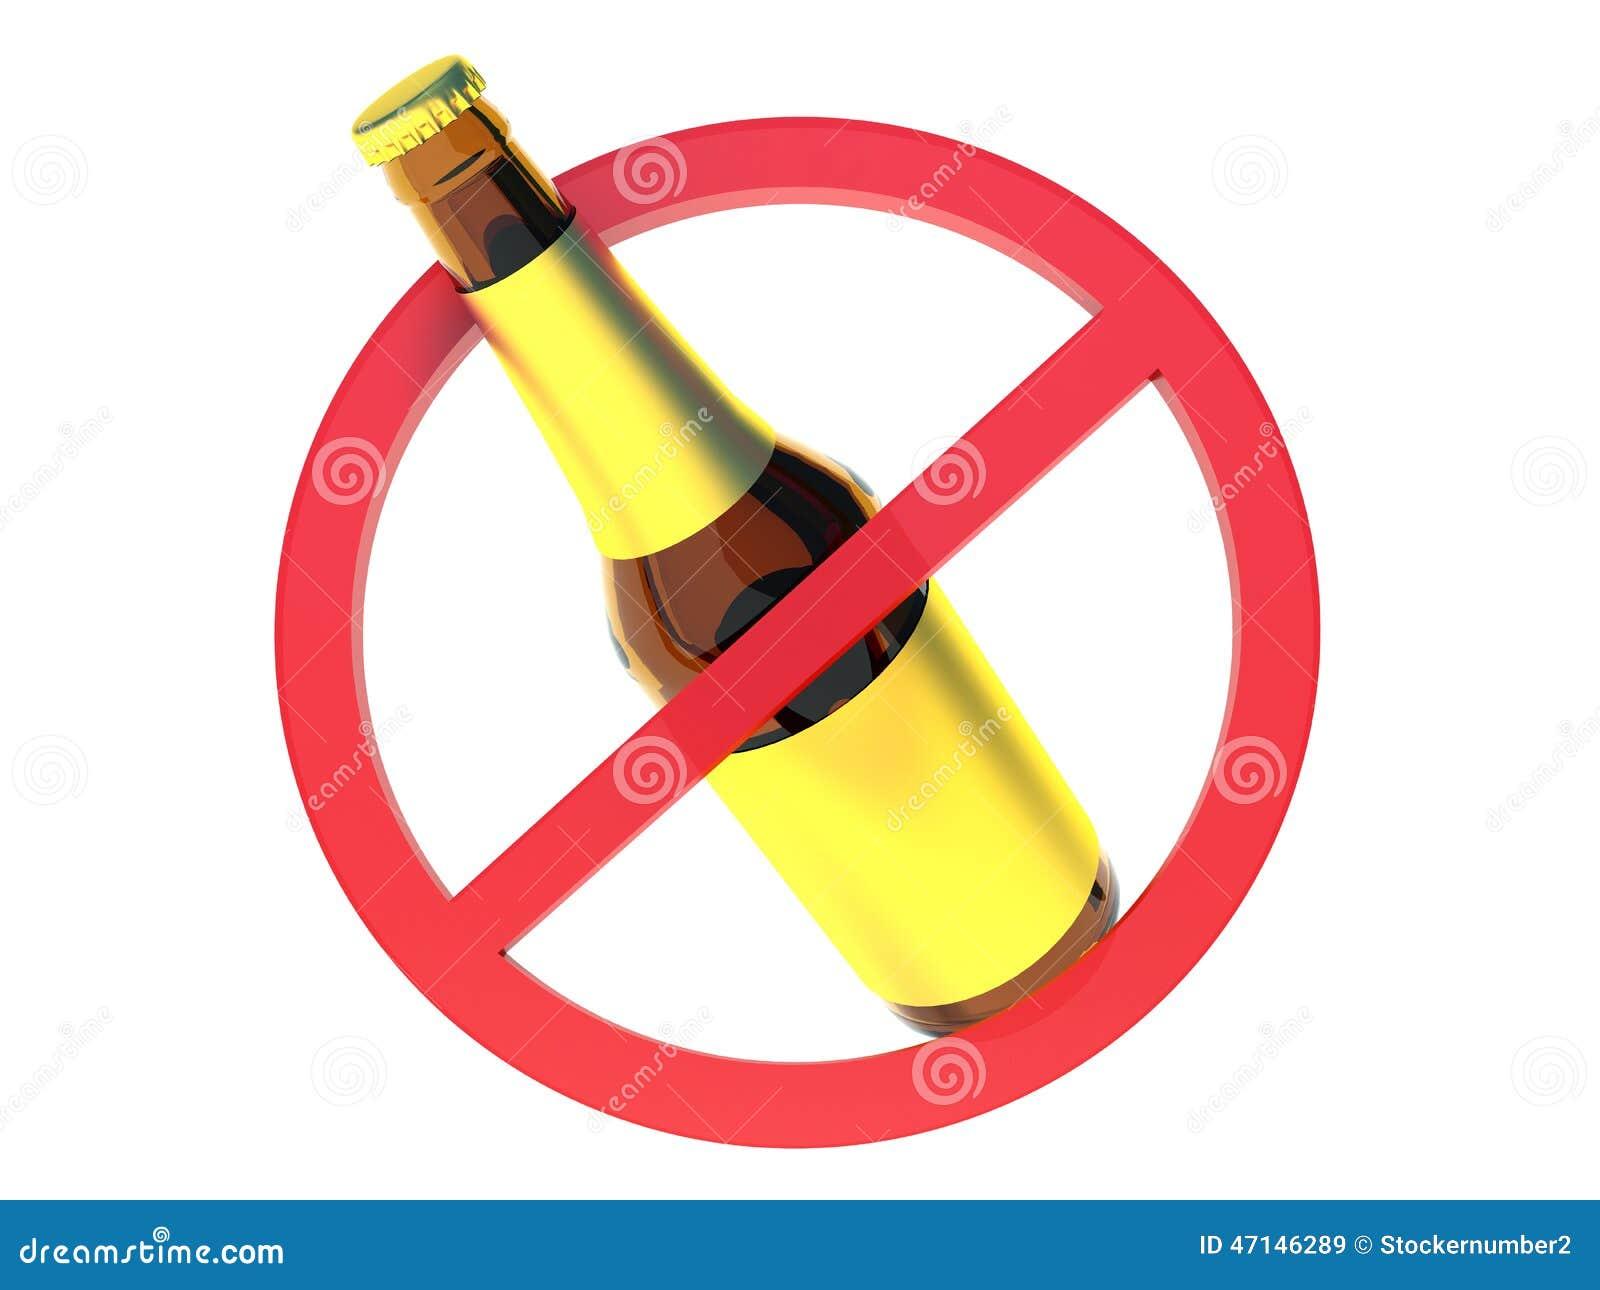 no alcohol sign bottle of beer on white isolated background 3d stock illustration image. Black Bedroom Furniture Sets. Home Design Ideas